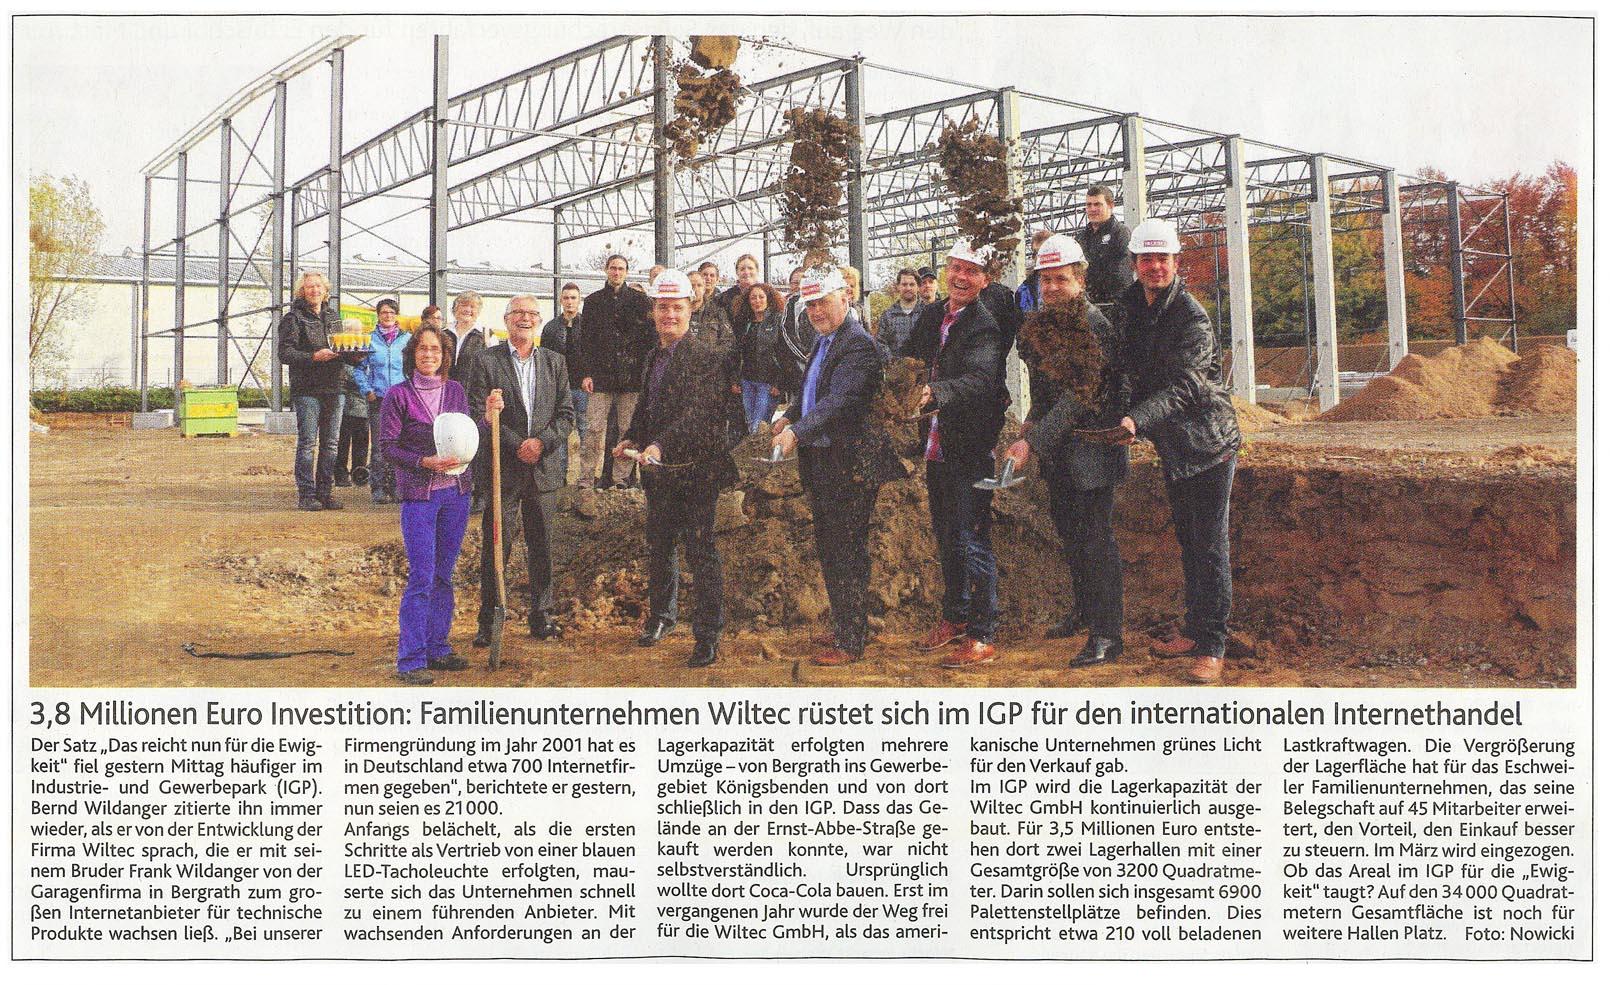 Newspaper: WilTec 3,5 million Euro Investment